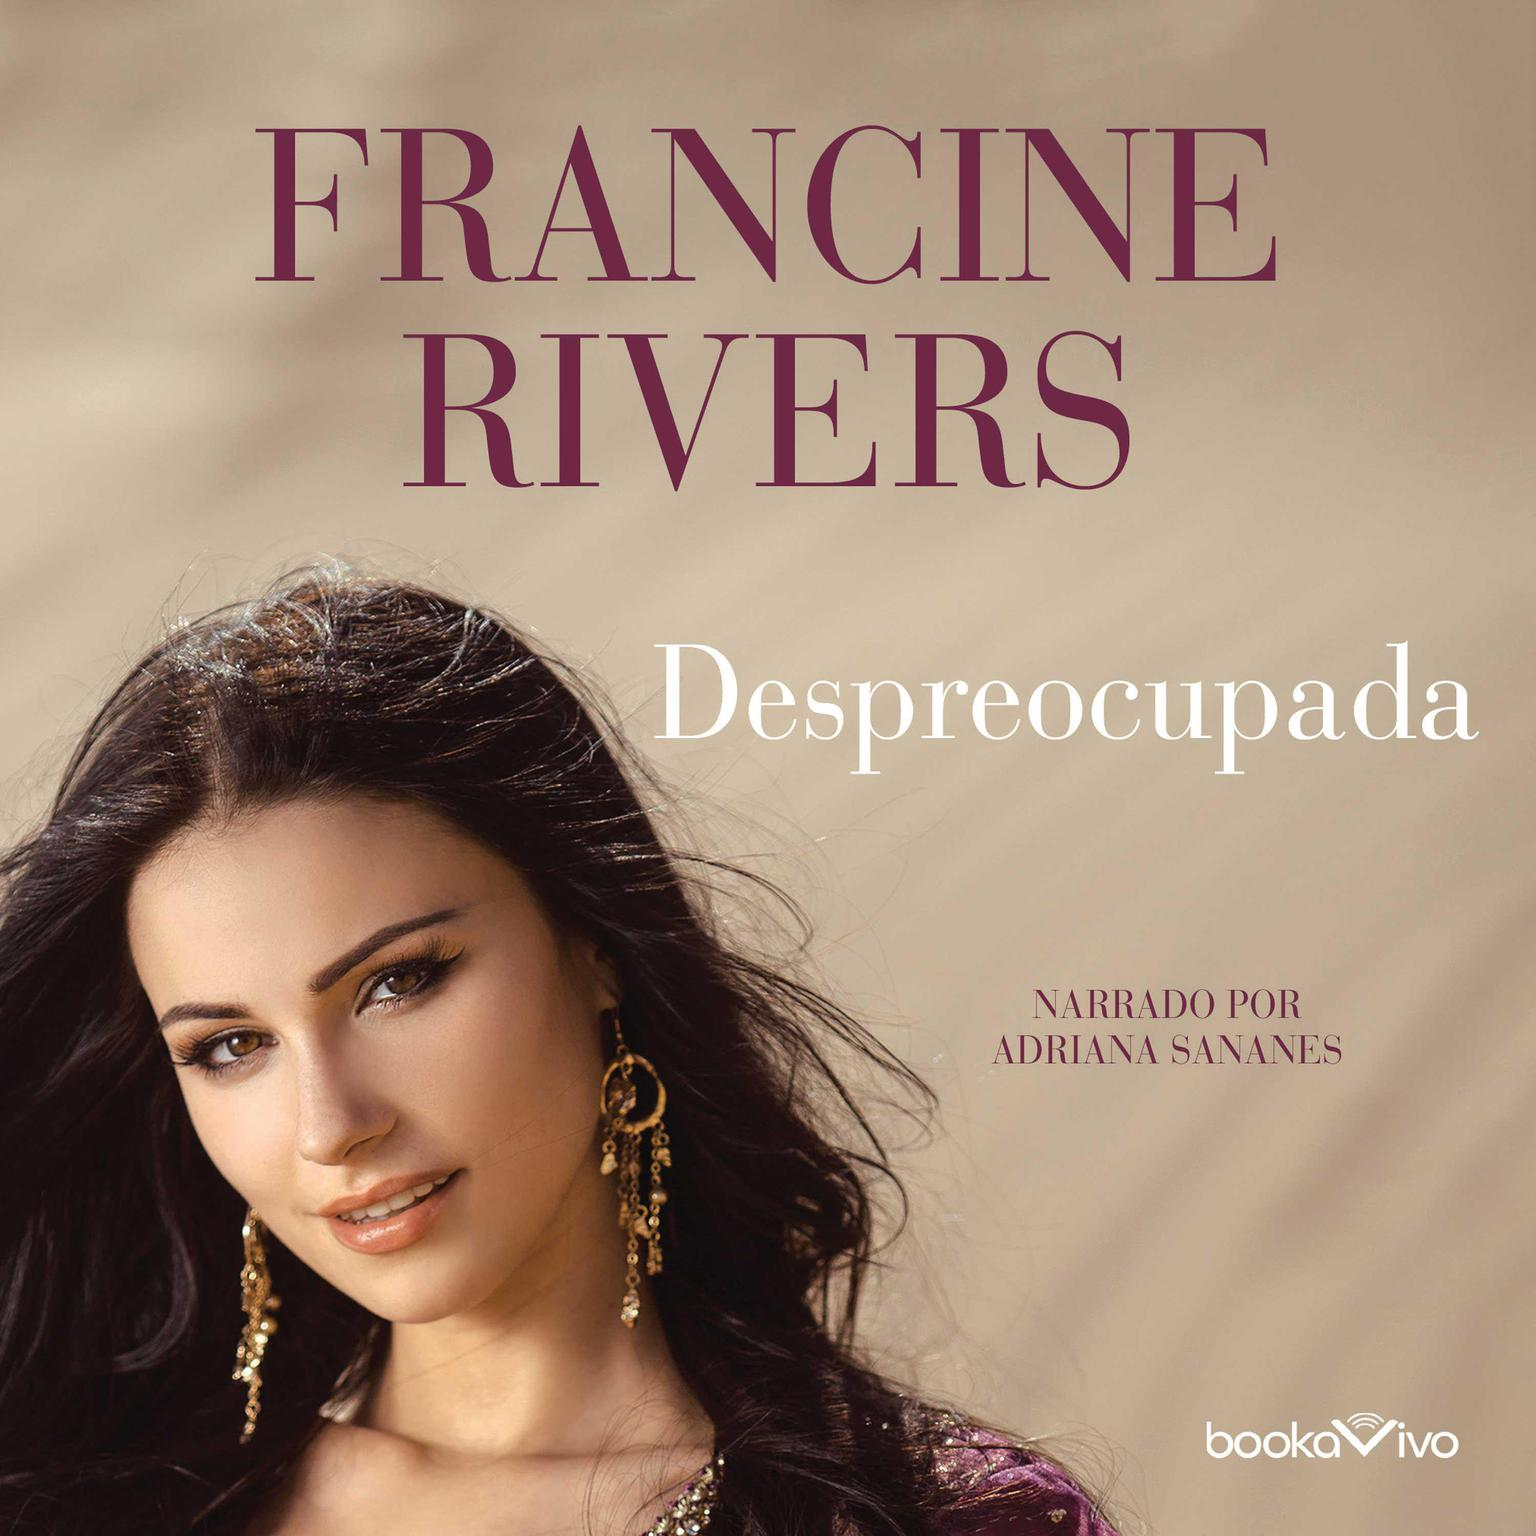 Despreocupada (Unspoken): Bathsheba Audiobook, by Francine Rivers